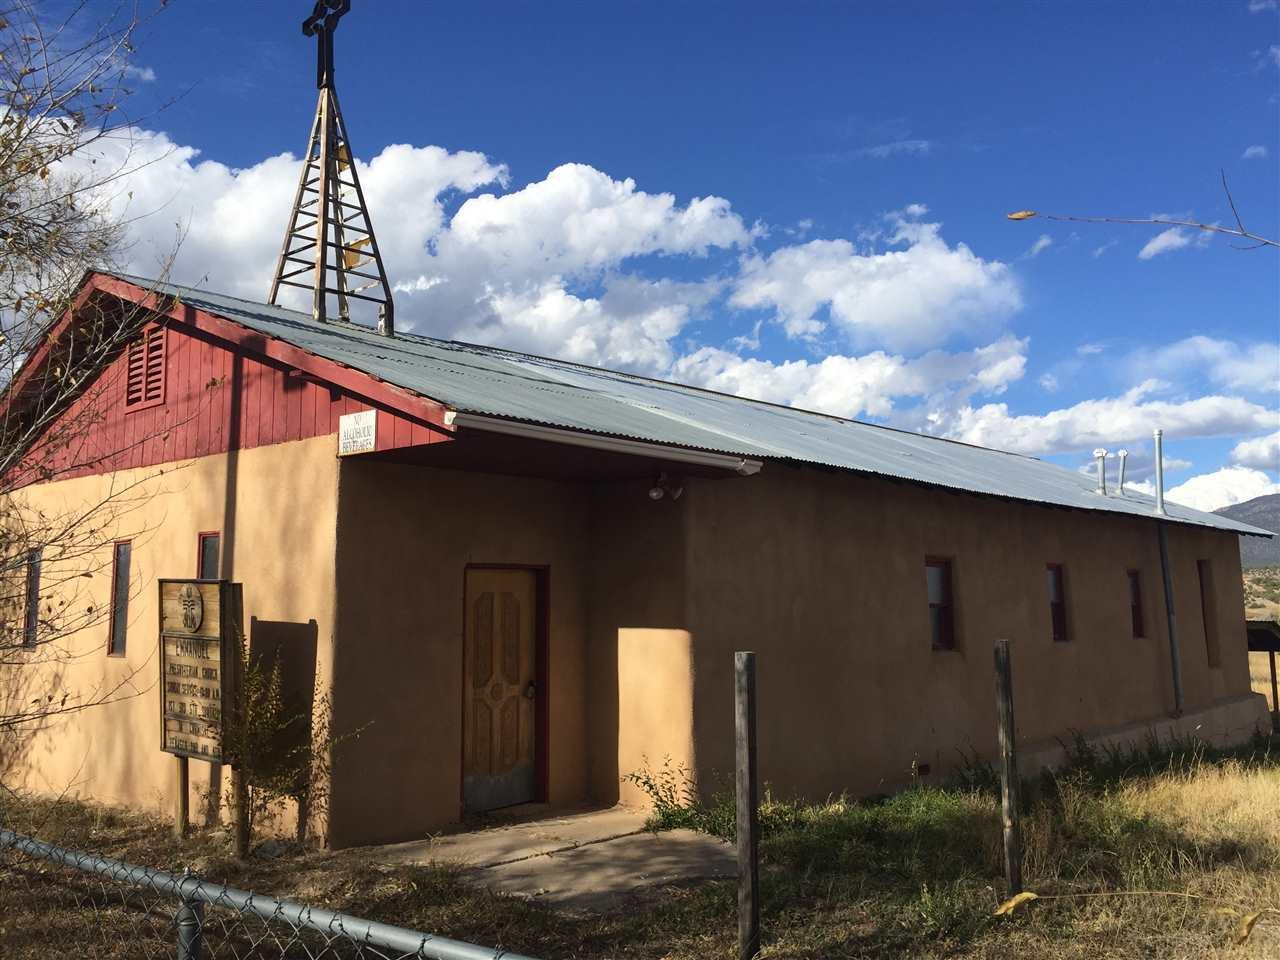 New mexico taos county penasco - Pe Asco Area